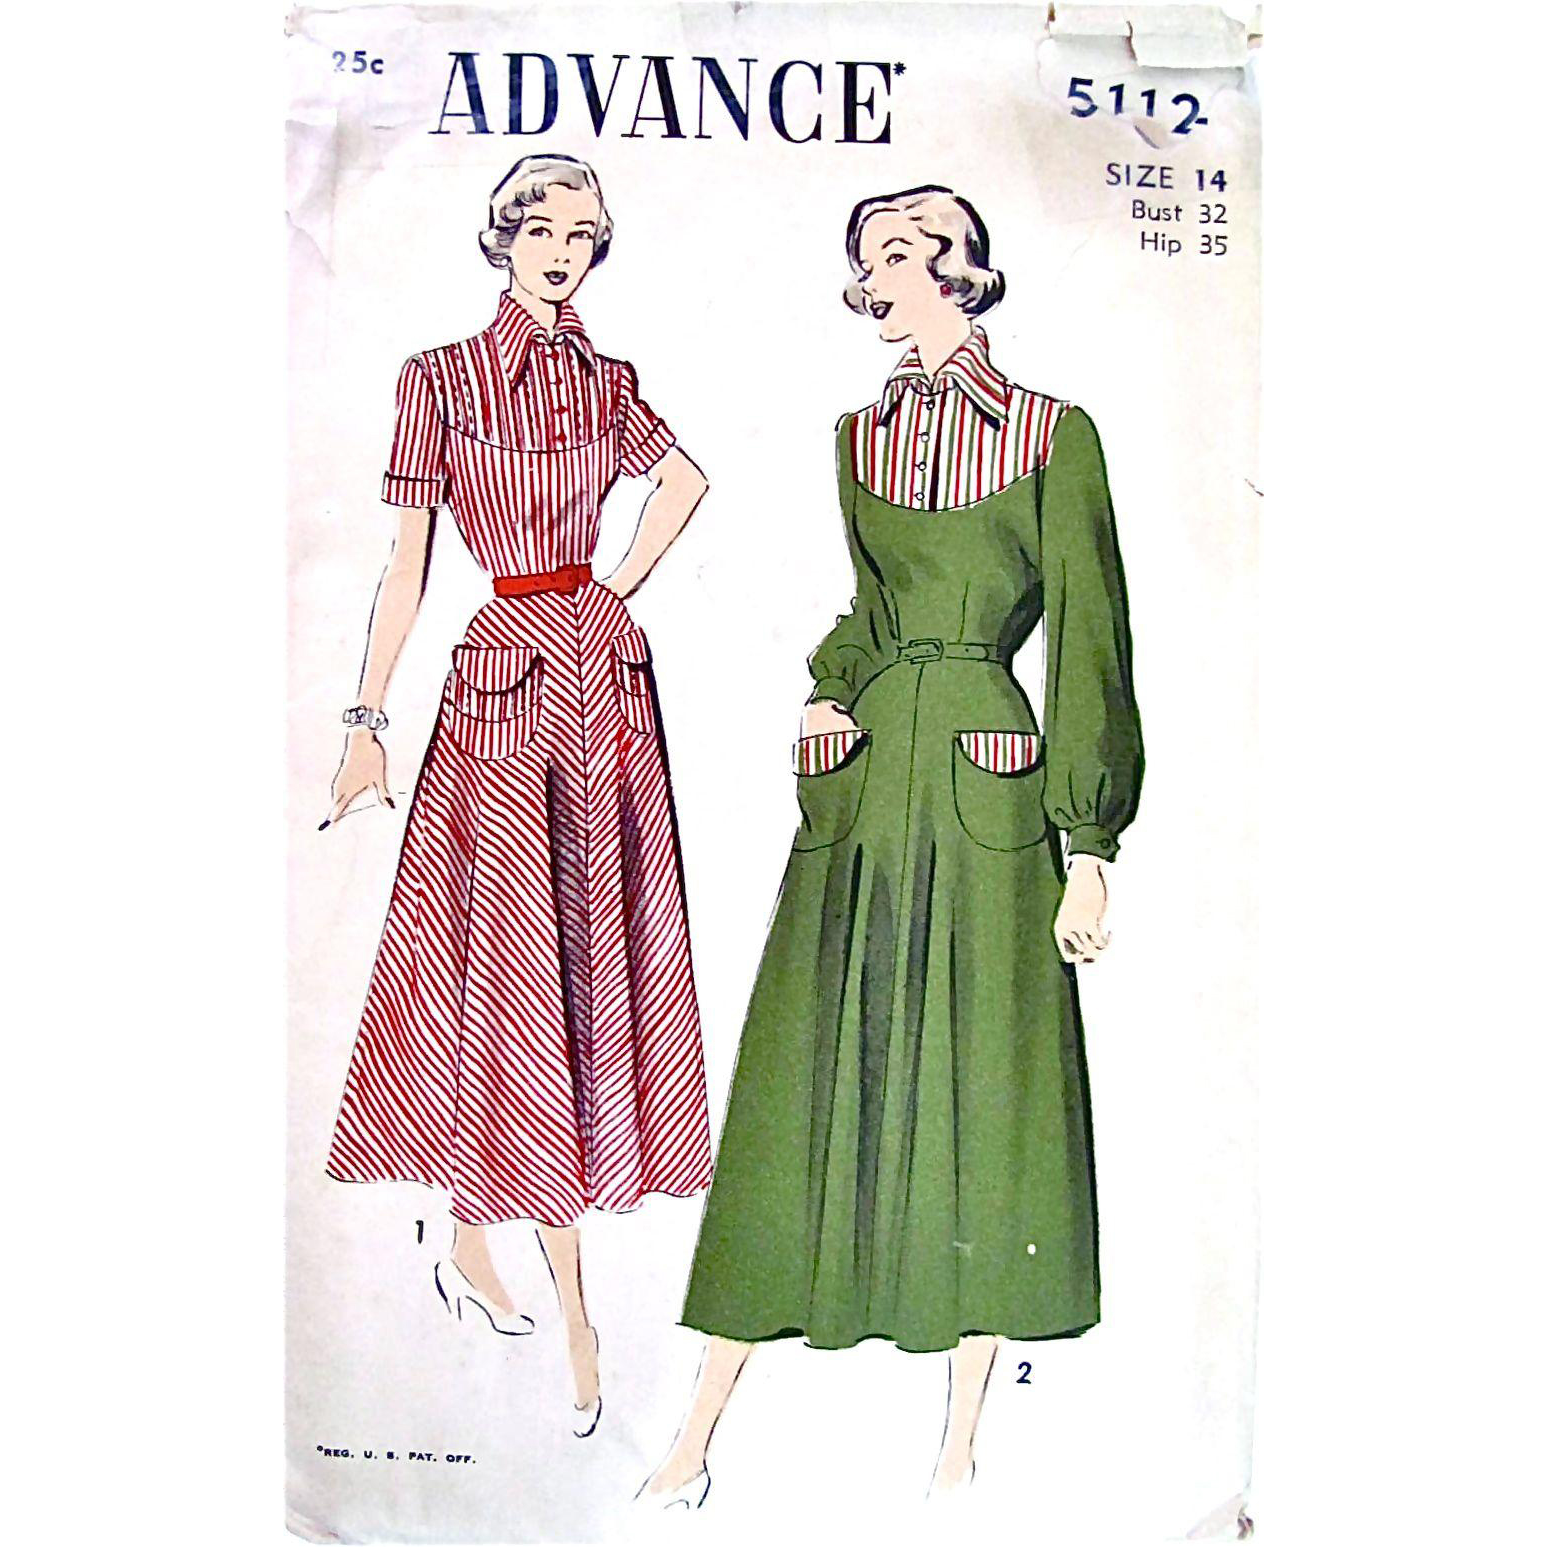 Advance Pattern 5112, Misses One-Piece Day Dress, Size 14 Bust 32, Vintage 1940s, Complete